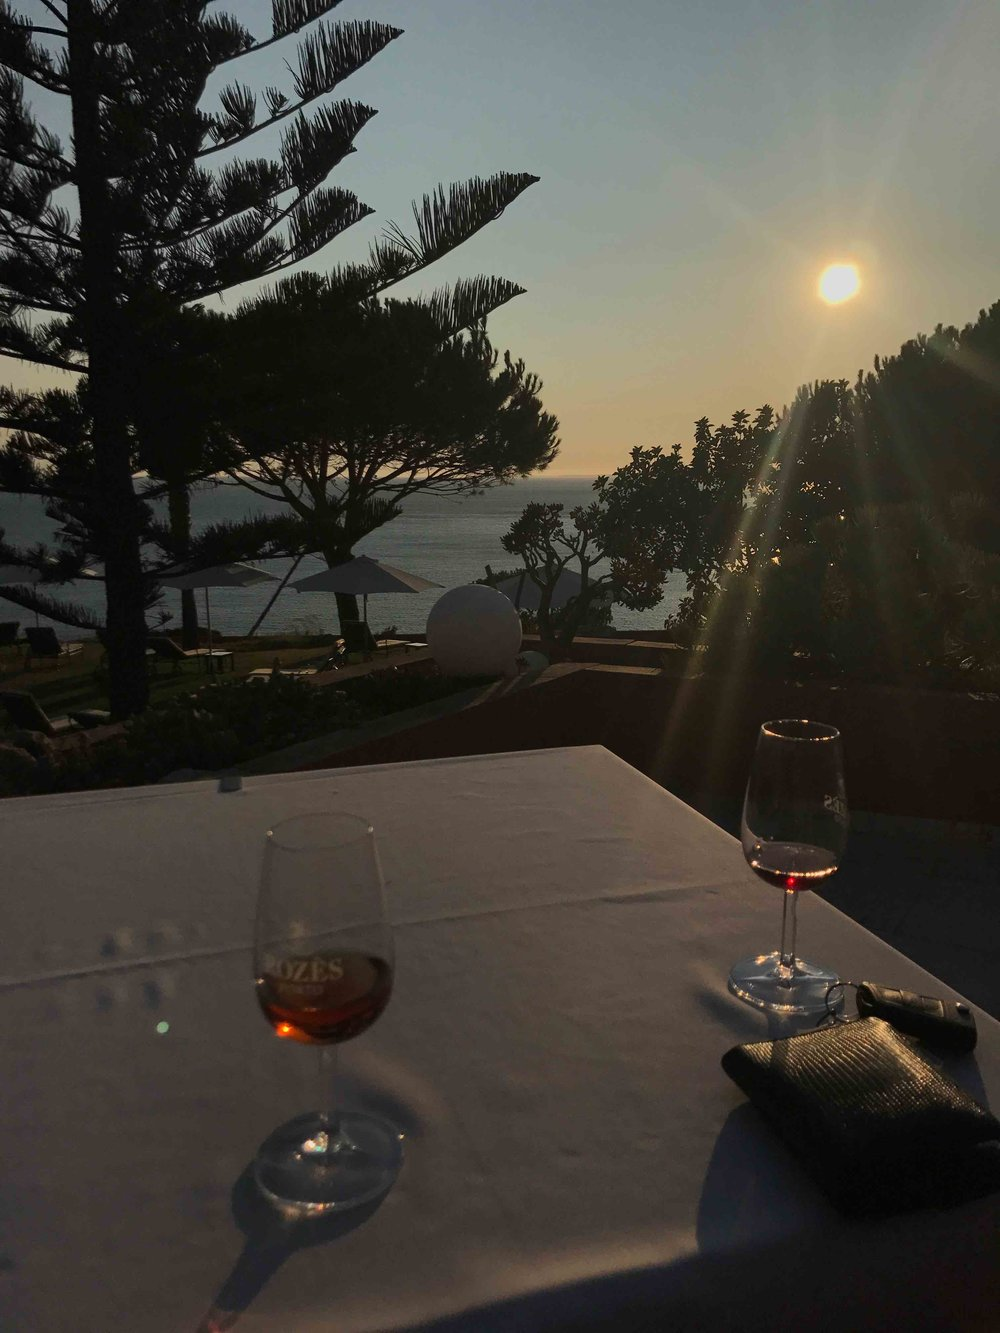 #disawistories #reiseblog #portugal #algarve #avivendamiranda #surfen #sonnenuntergang #portwine.jpg